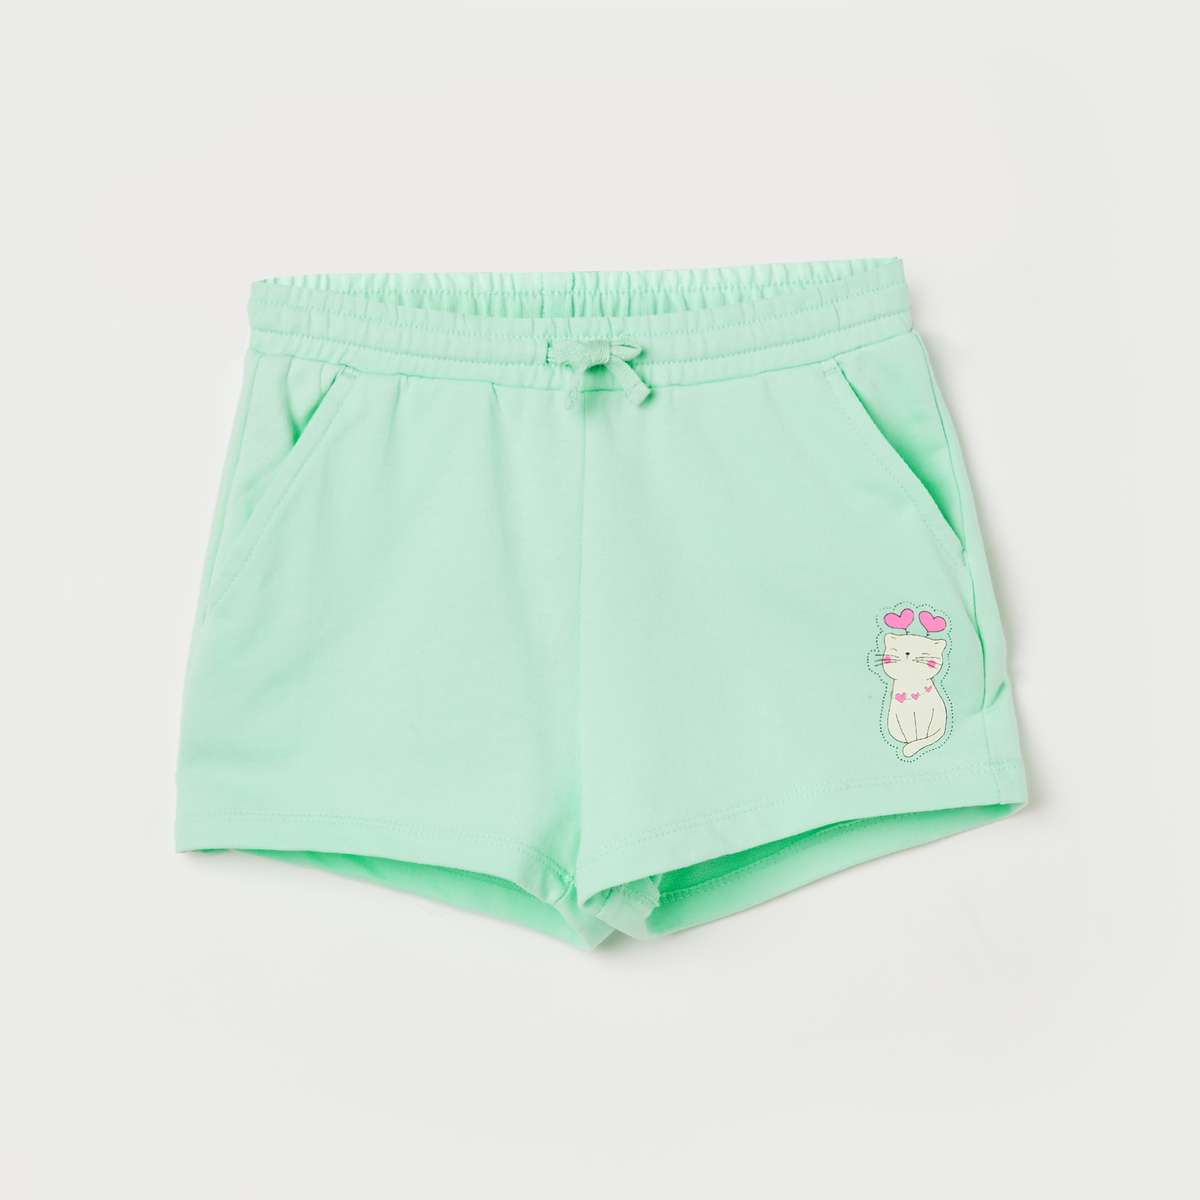 2.FAME FOREVER KIDS Girls Printed Elasticated Shorts